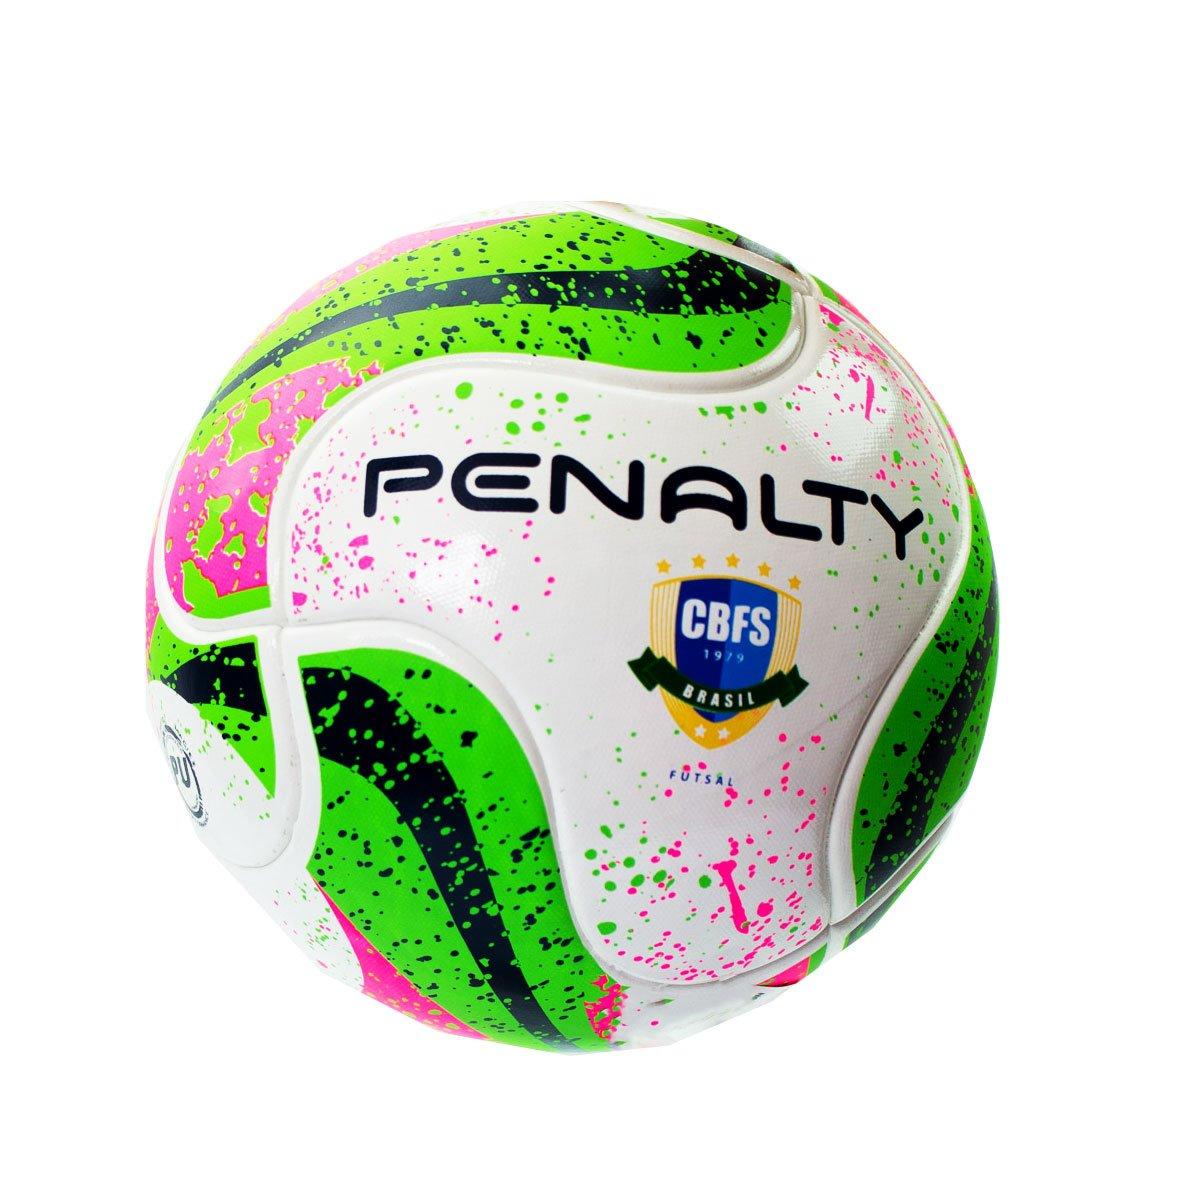 Bizz Store - Bola Futsal Penalty Max 500 Termotec PU 9befde9142a89